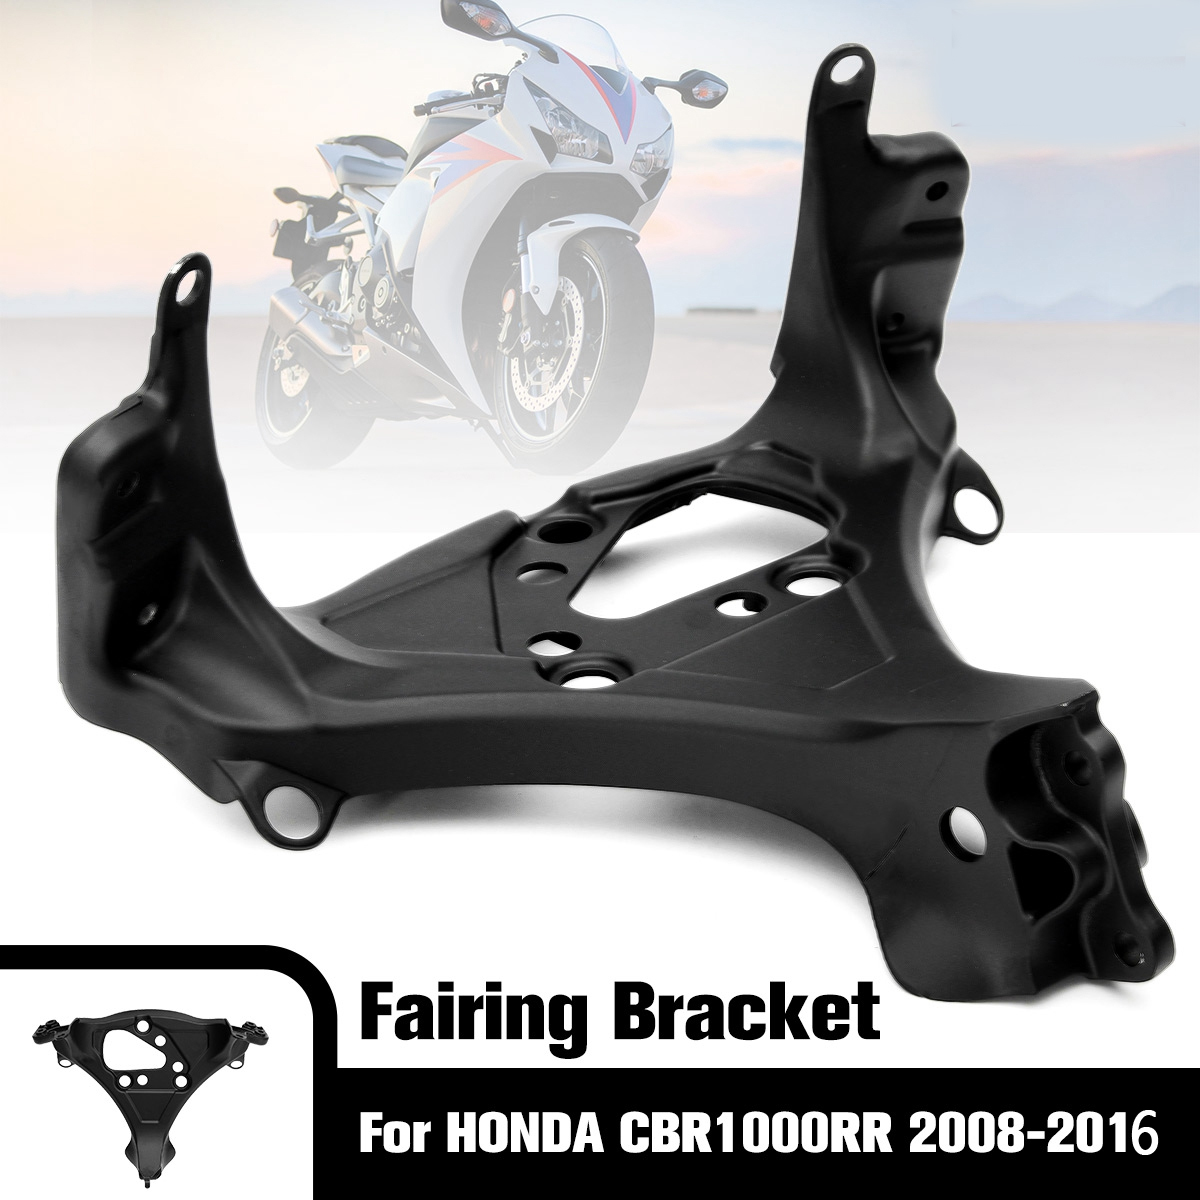 CBR1000RR Upper Fairing Stay Bracket Cowling Headlight For Honda CBR 1000RR 2008 2009 2010 2011 2012 2013 2014 2015 2016